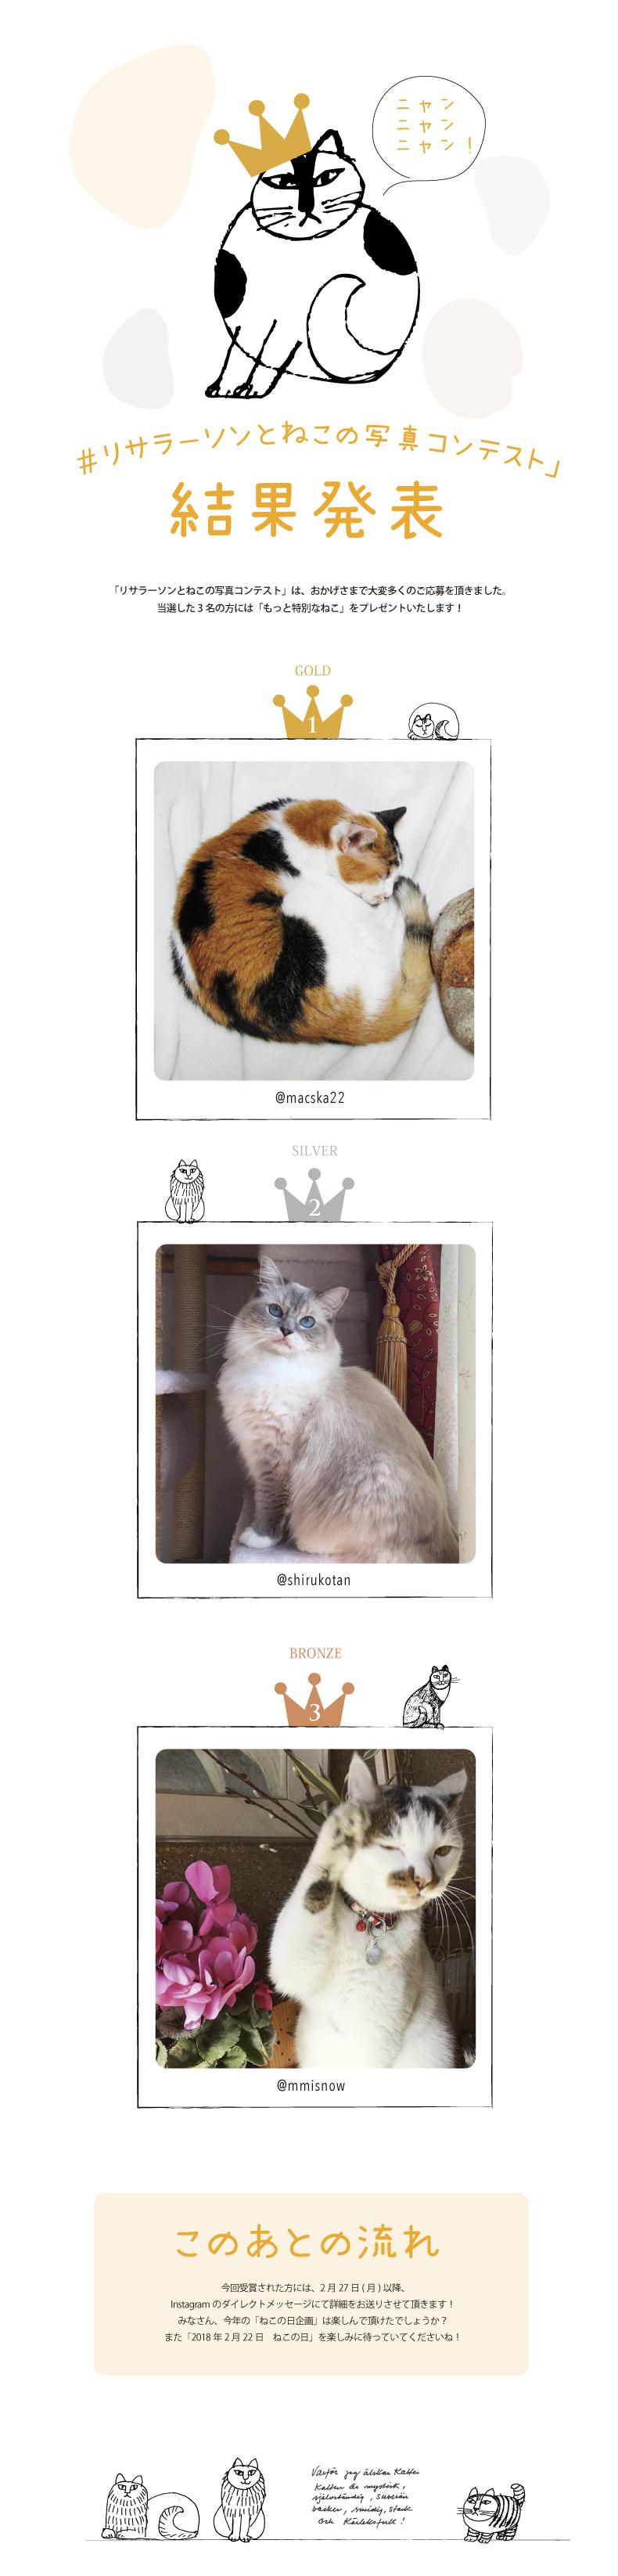 catcontest.jpg